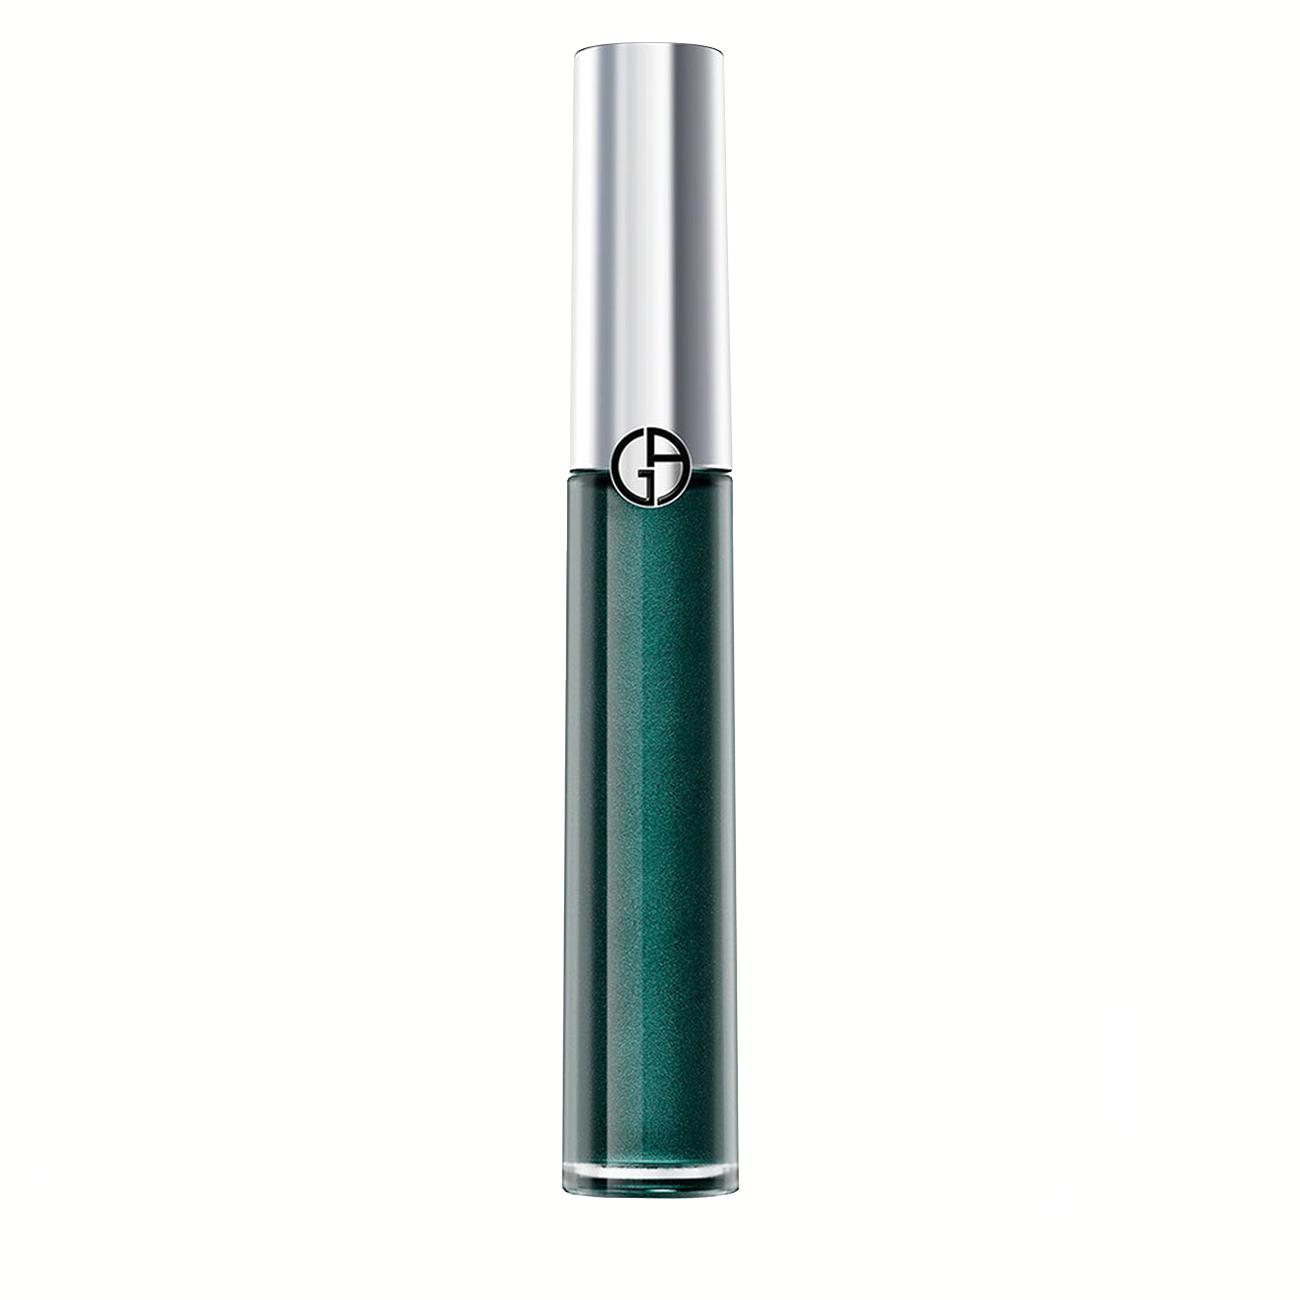 Eye Tint Eyeshadow 4 6.5ml Giorgio Armani imagine 2021 bestvalue.eu